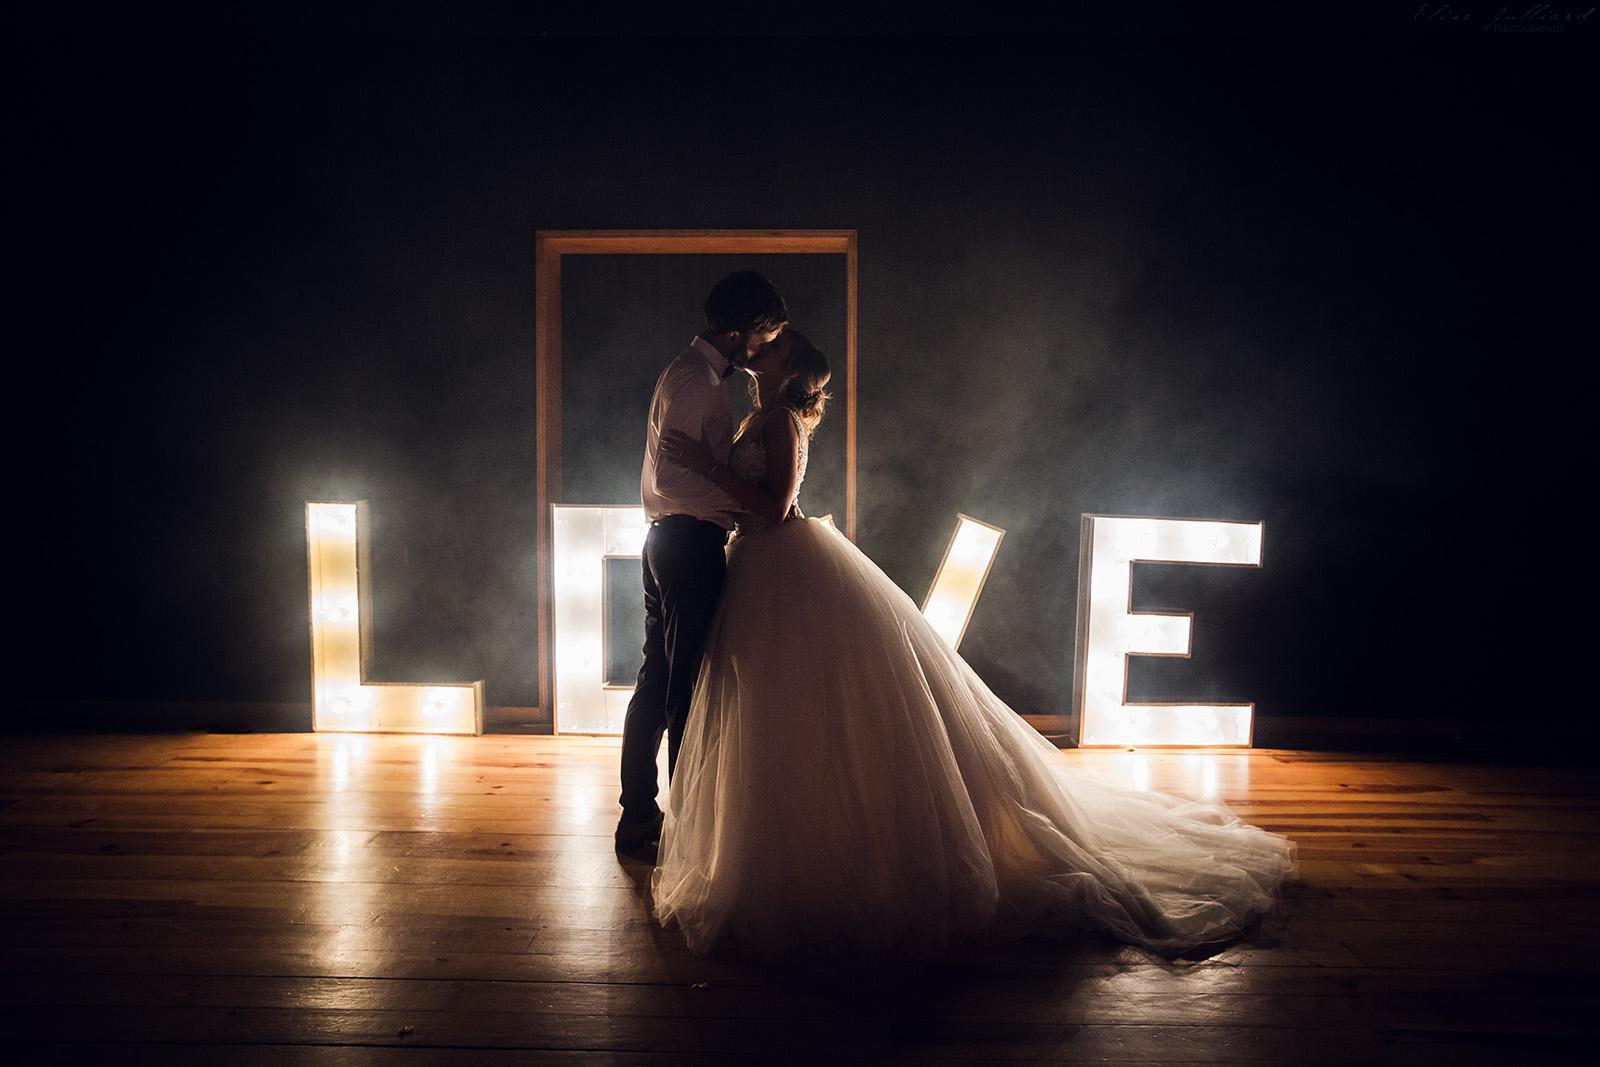 reportage-mariage-photographe-elise-julliard-wedding-photographer-genas-lyon-seance-photo-couple-auvergne-rhone-alpes-simandres-13